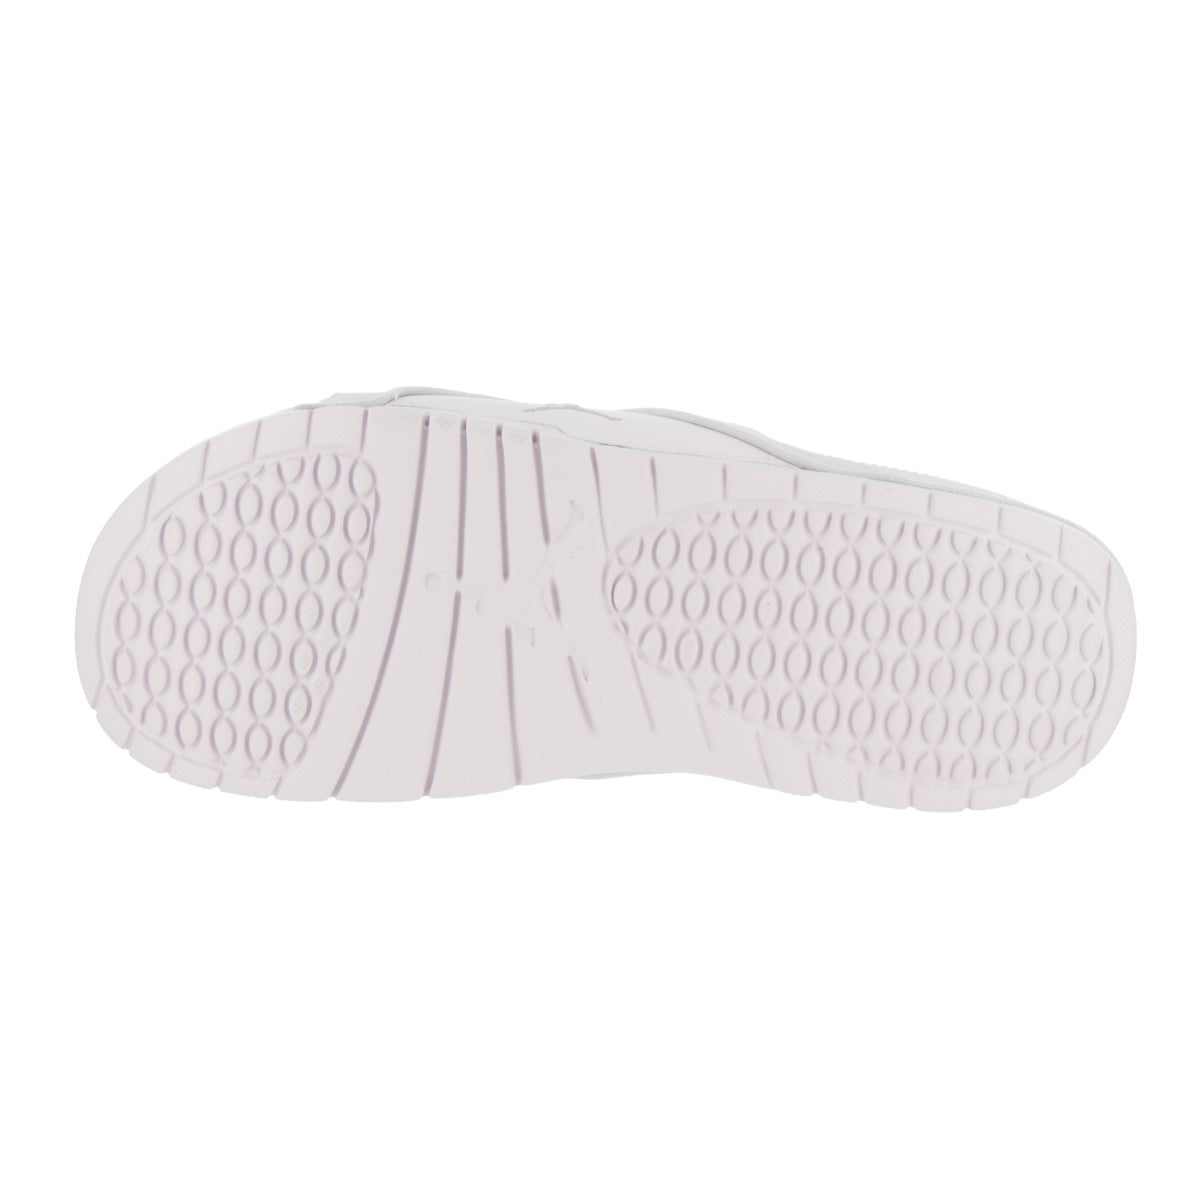 4ce64704b Shop Nike Men s Jordan Hydro IV Retro Sandal - Free Shipping Today -  Overstock - 15858445